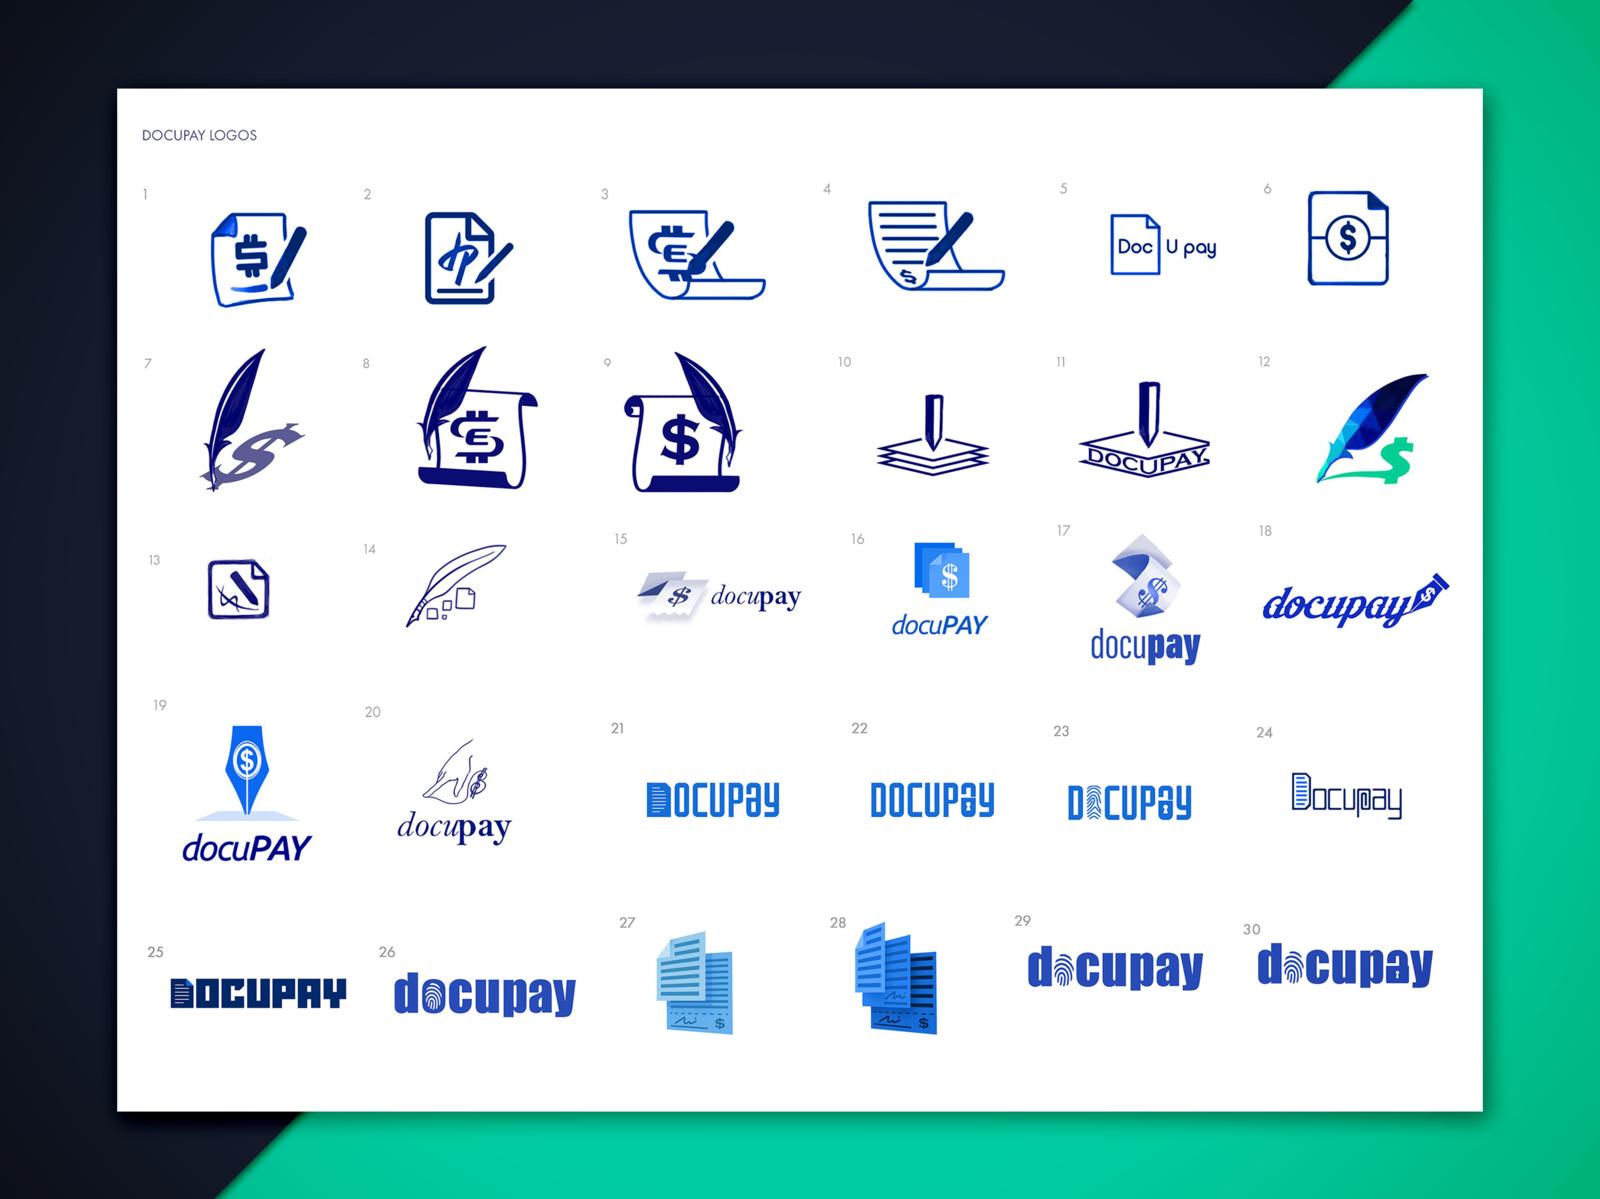 DocuPay and EMoney Golf Logos Designs